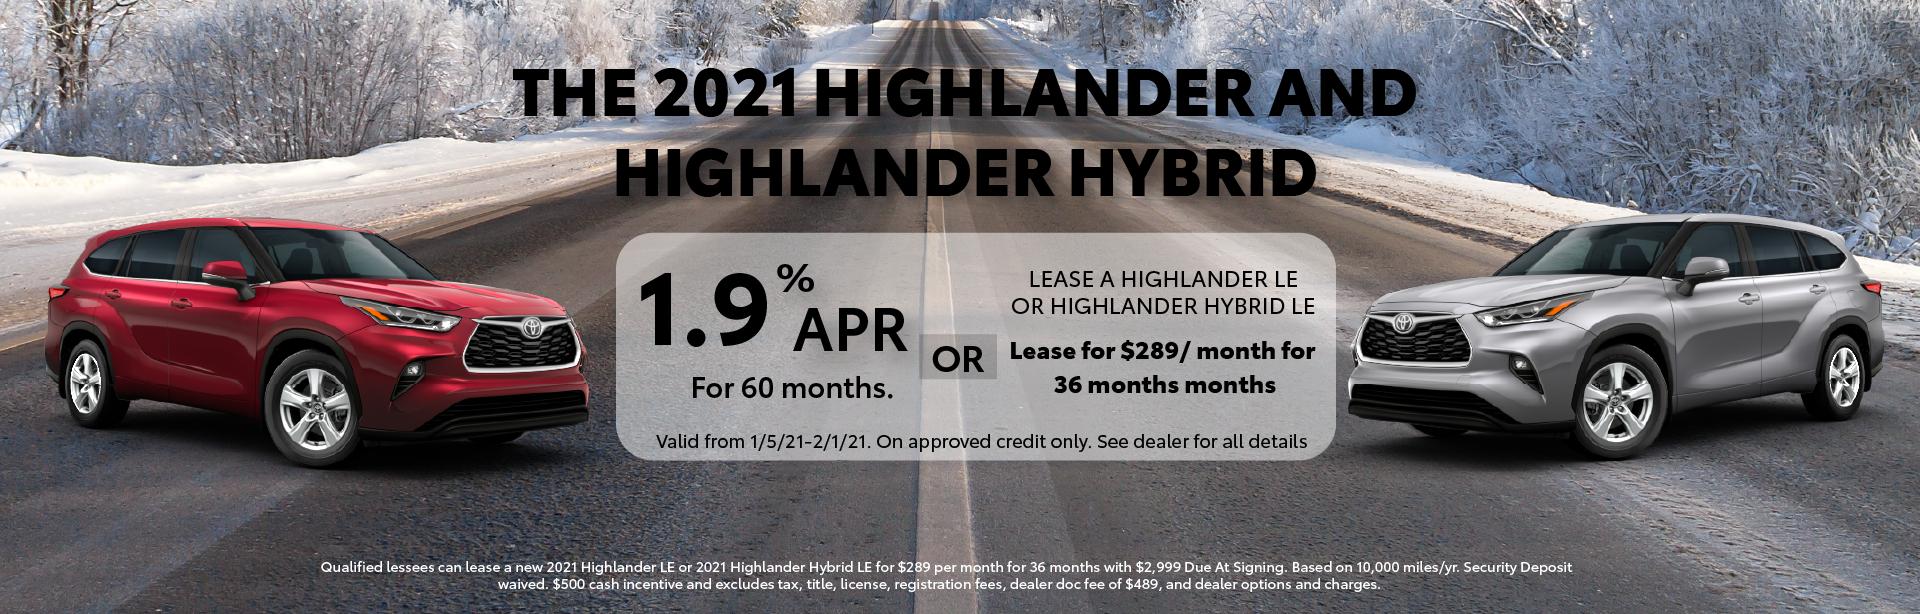 Highlander – Dealer Inspire Homepage – Glen Toyota